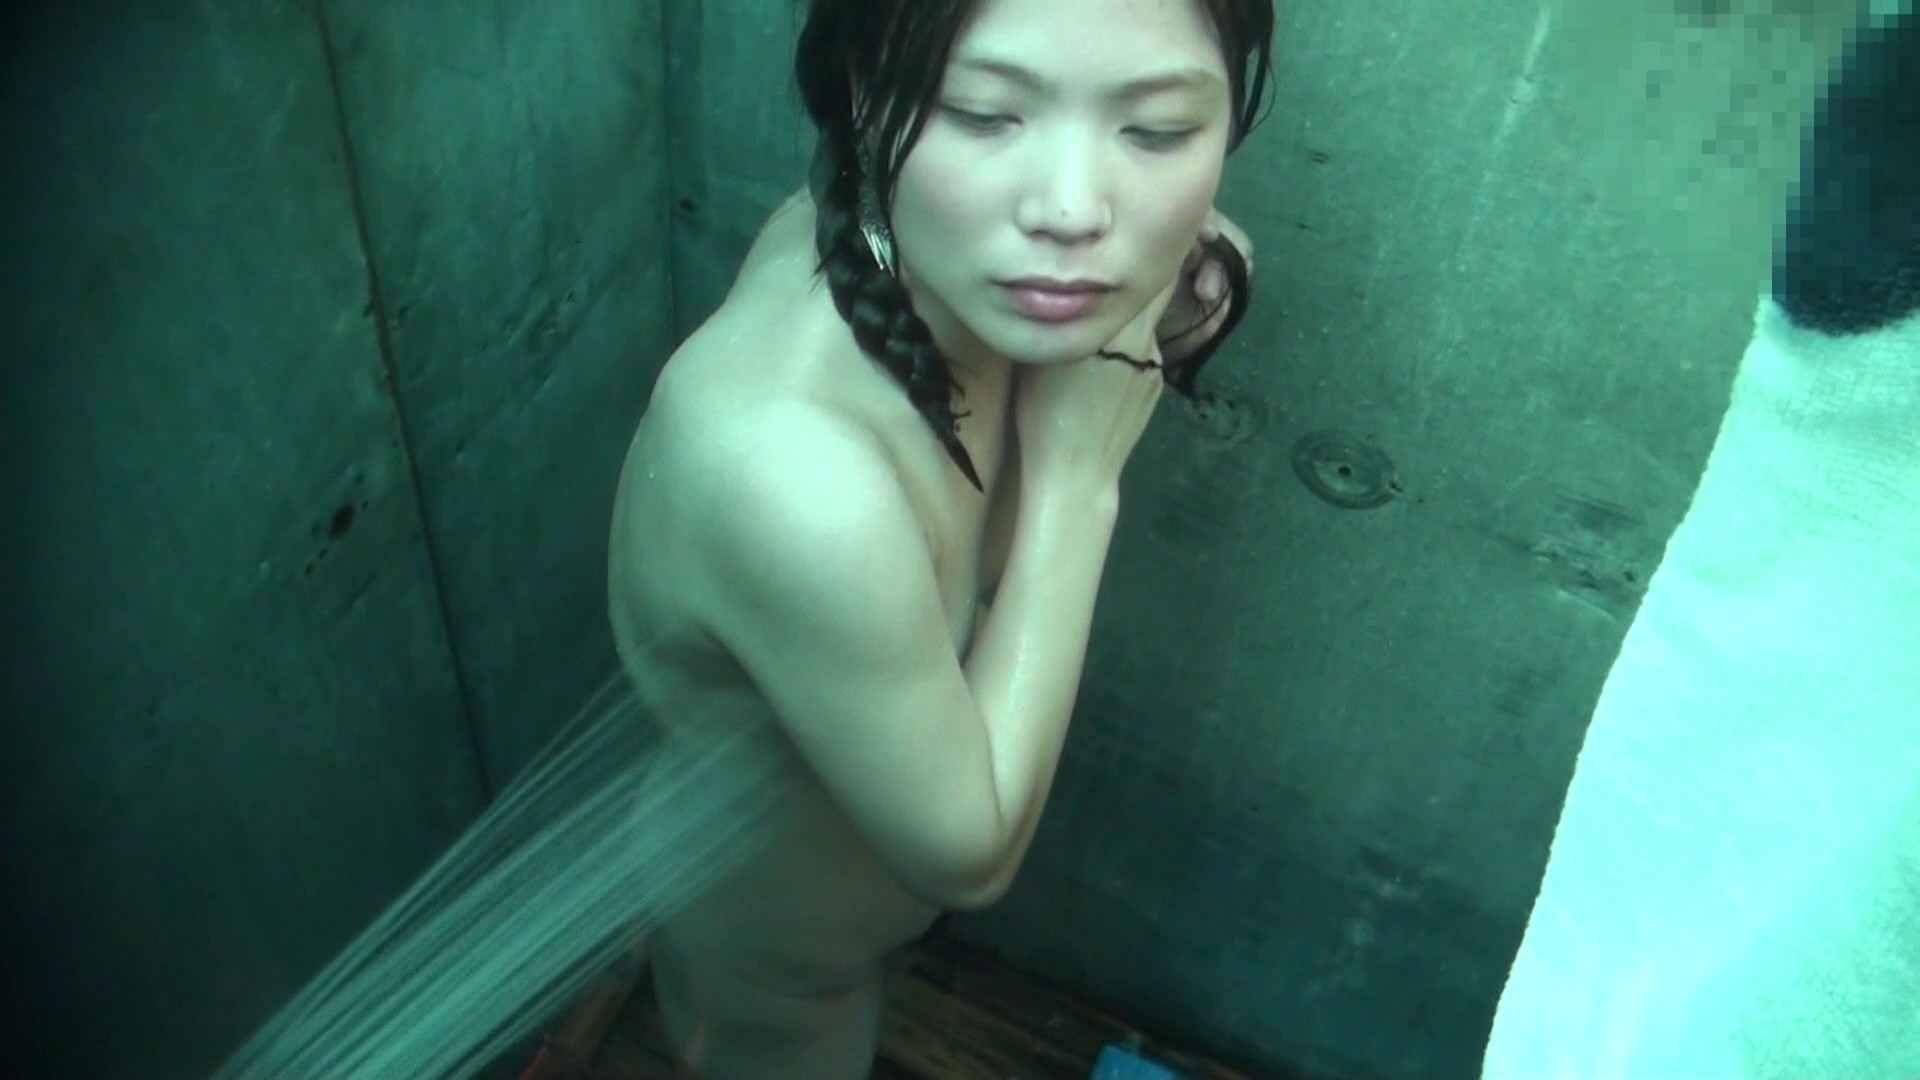 Vol.12 女性の性器には予想外の砂が混入しているようです。 シャワー中 | 高画質  96連発 49